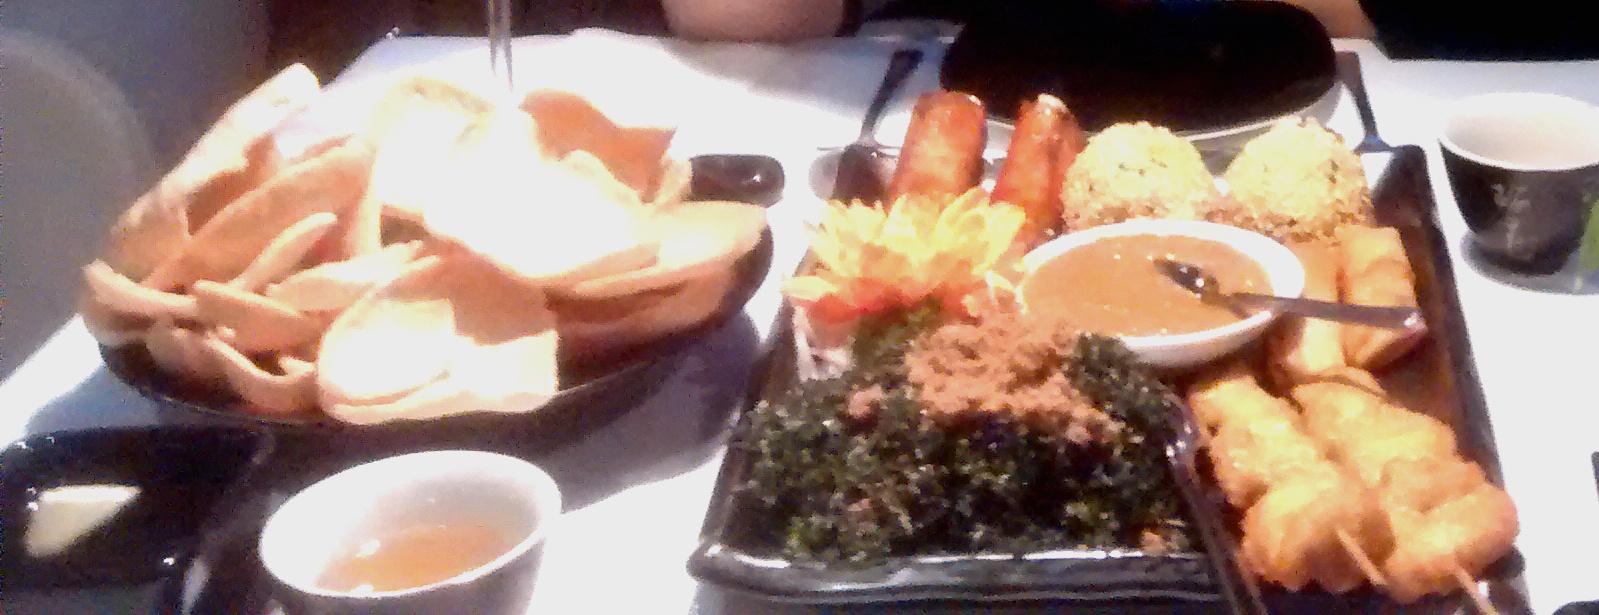 Zenxi chelmsford food